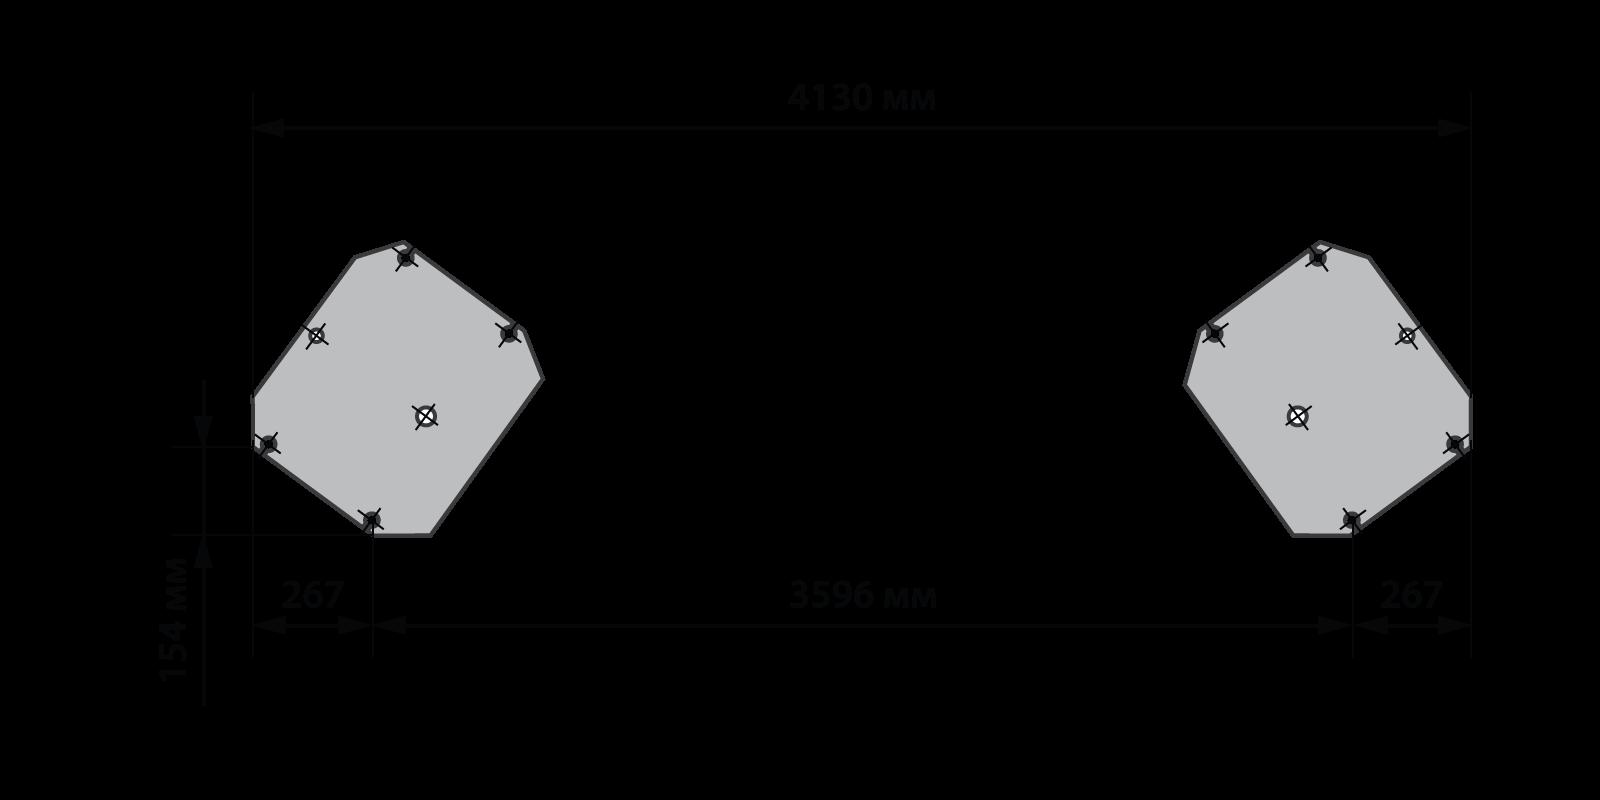 TLT250AT(C)_Asymmetry-01.jpg